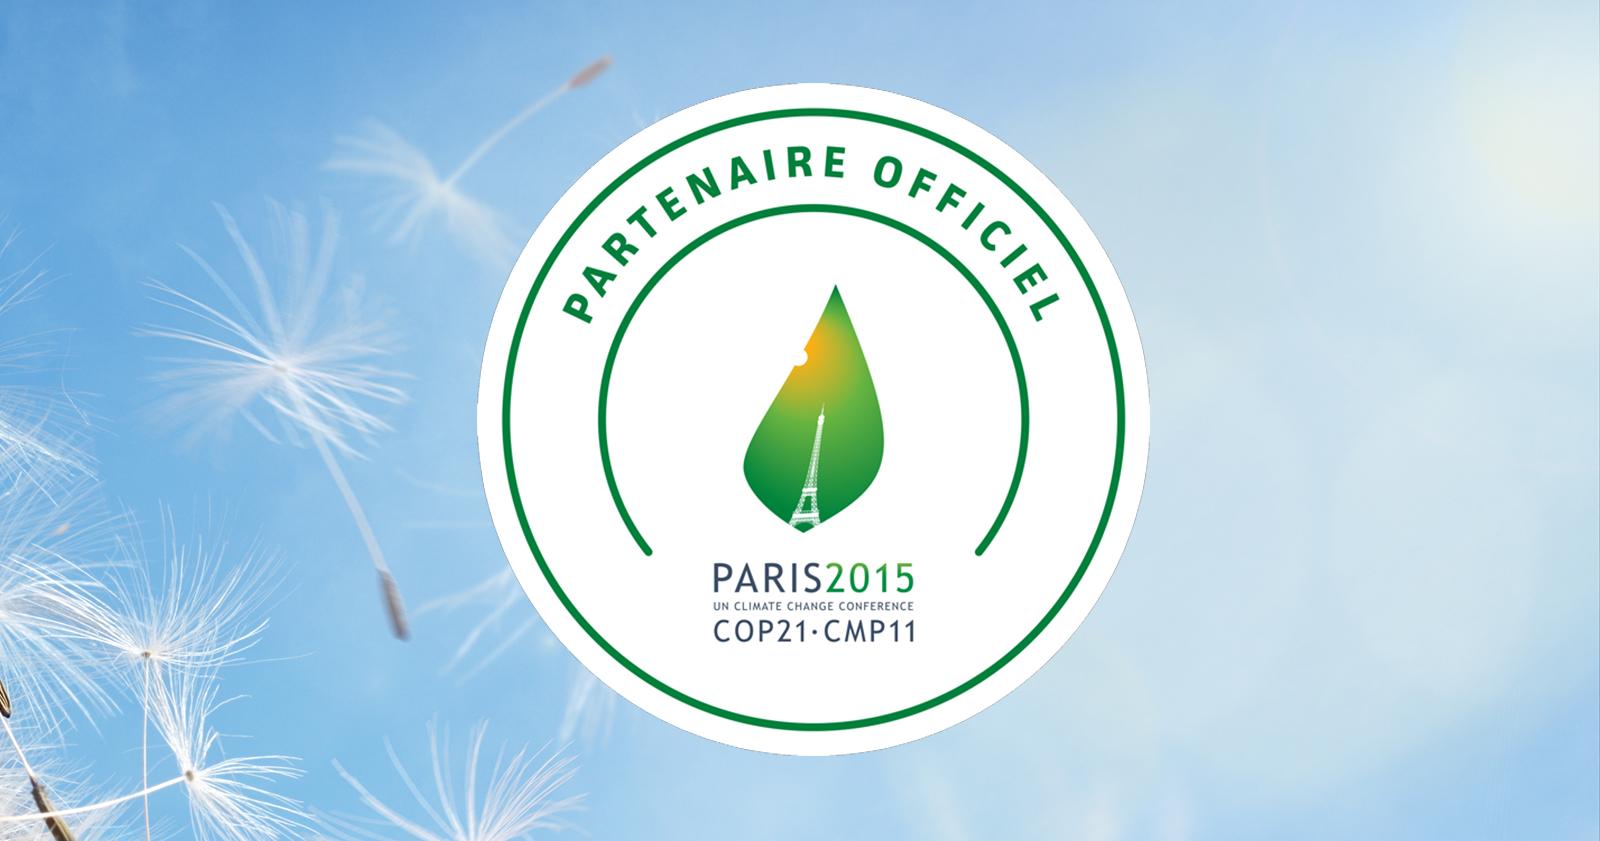 Partenaire officiel de la COP21